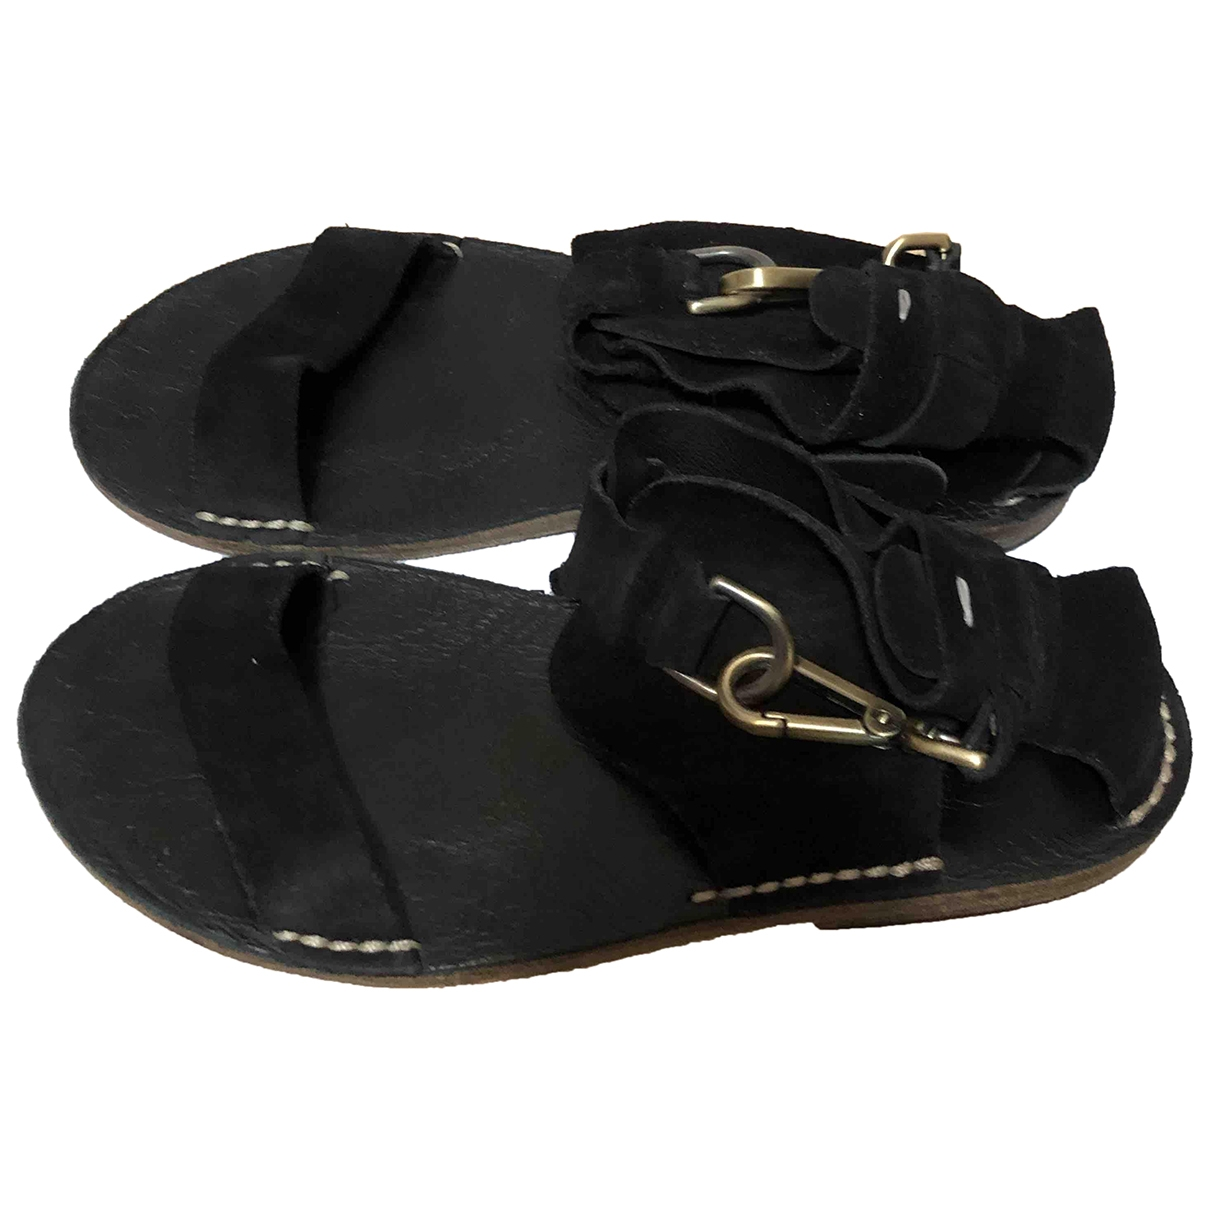 Maison Martin Margiela \N Black Suede Sandals for Women 40 EU